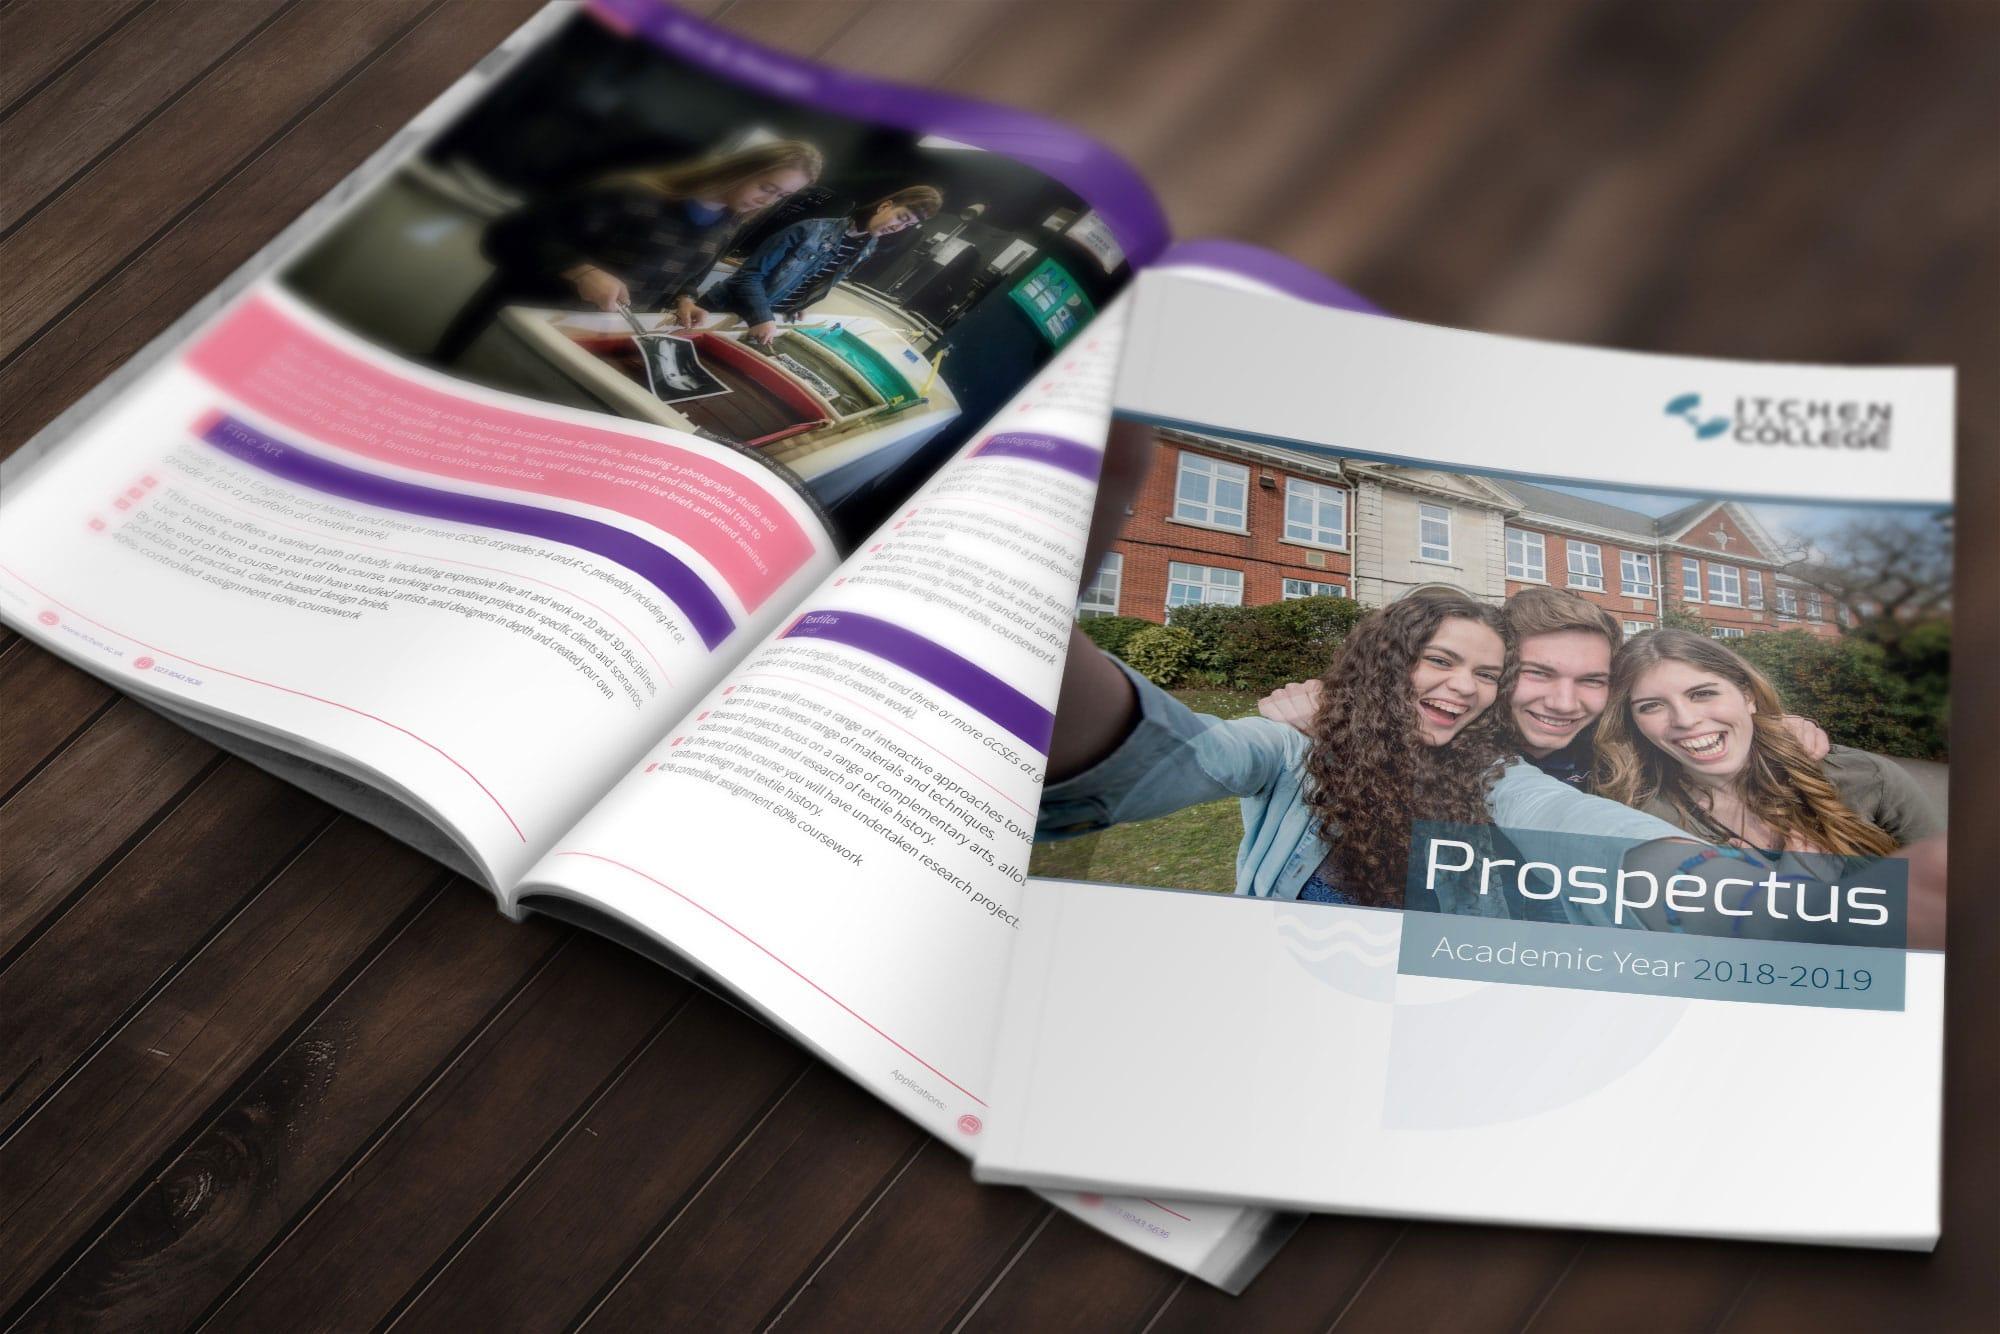 isfc-prospectus-mockup-2